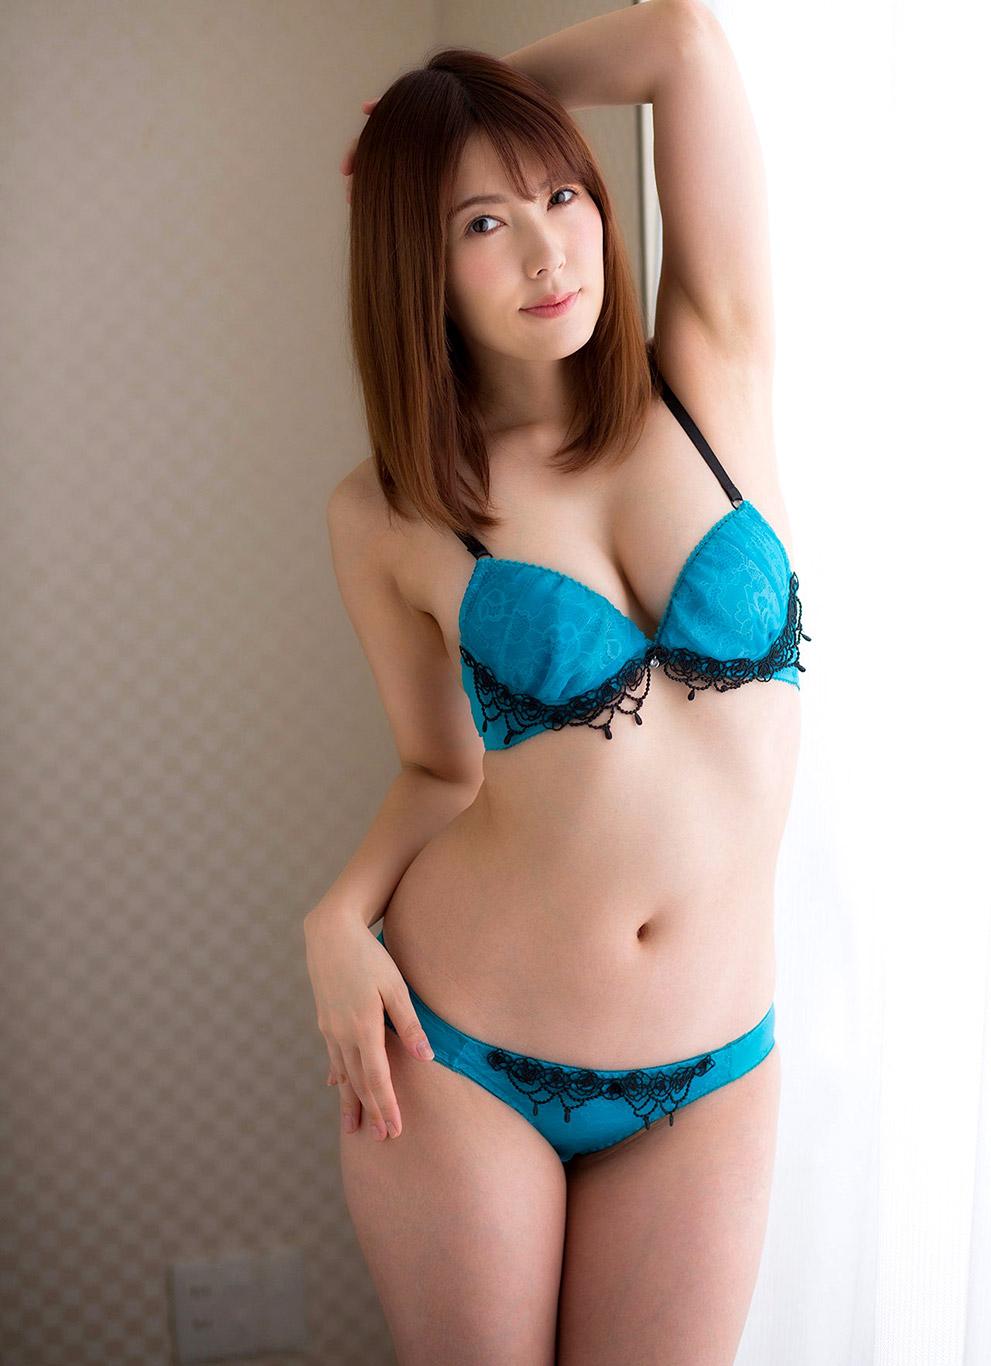 Yui hatano pics